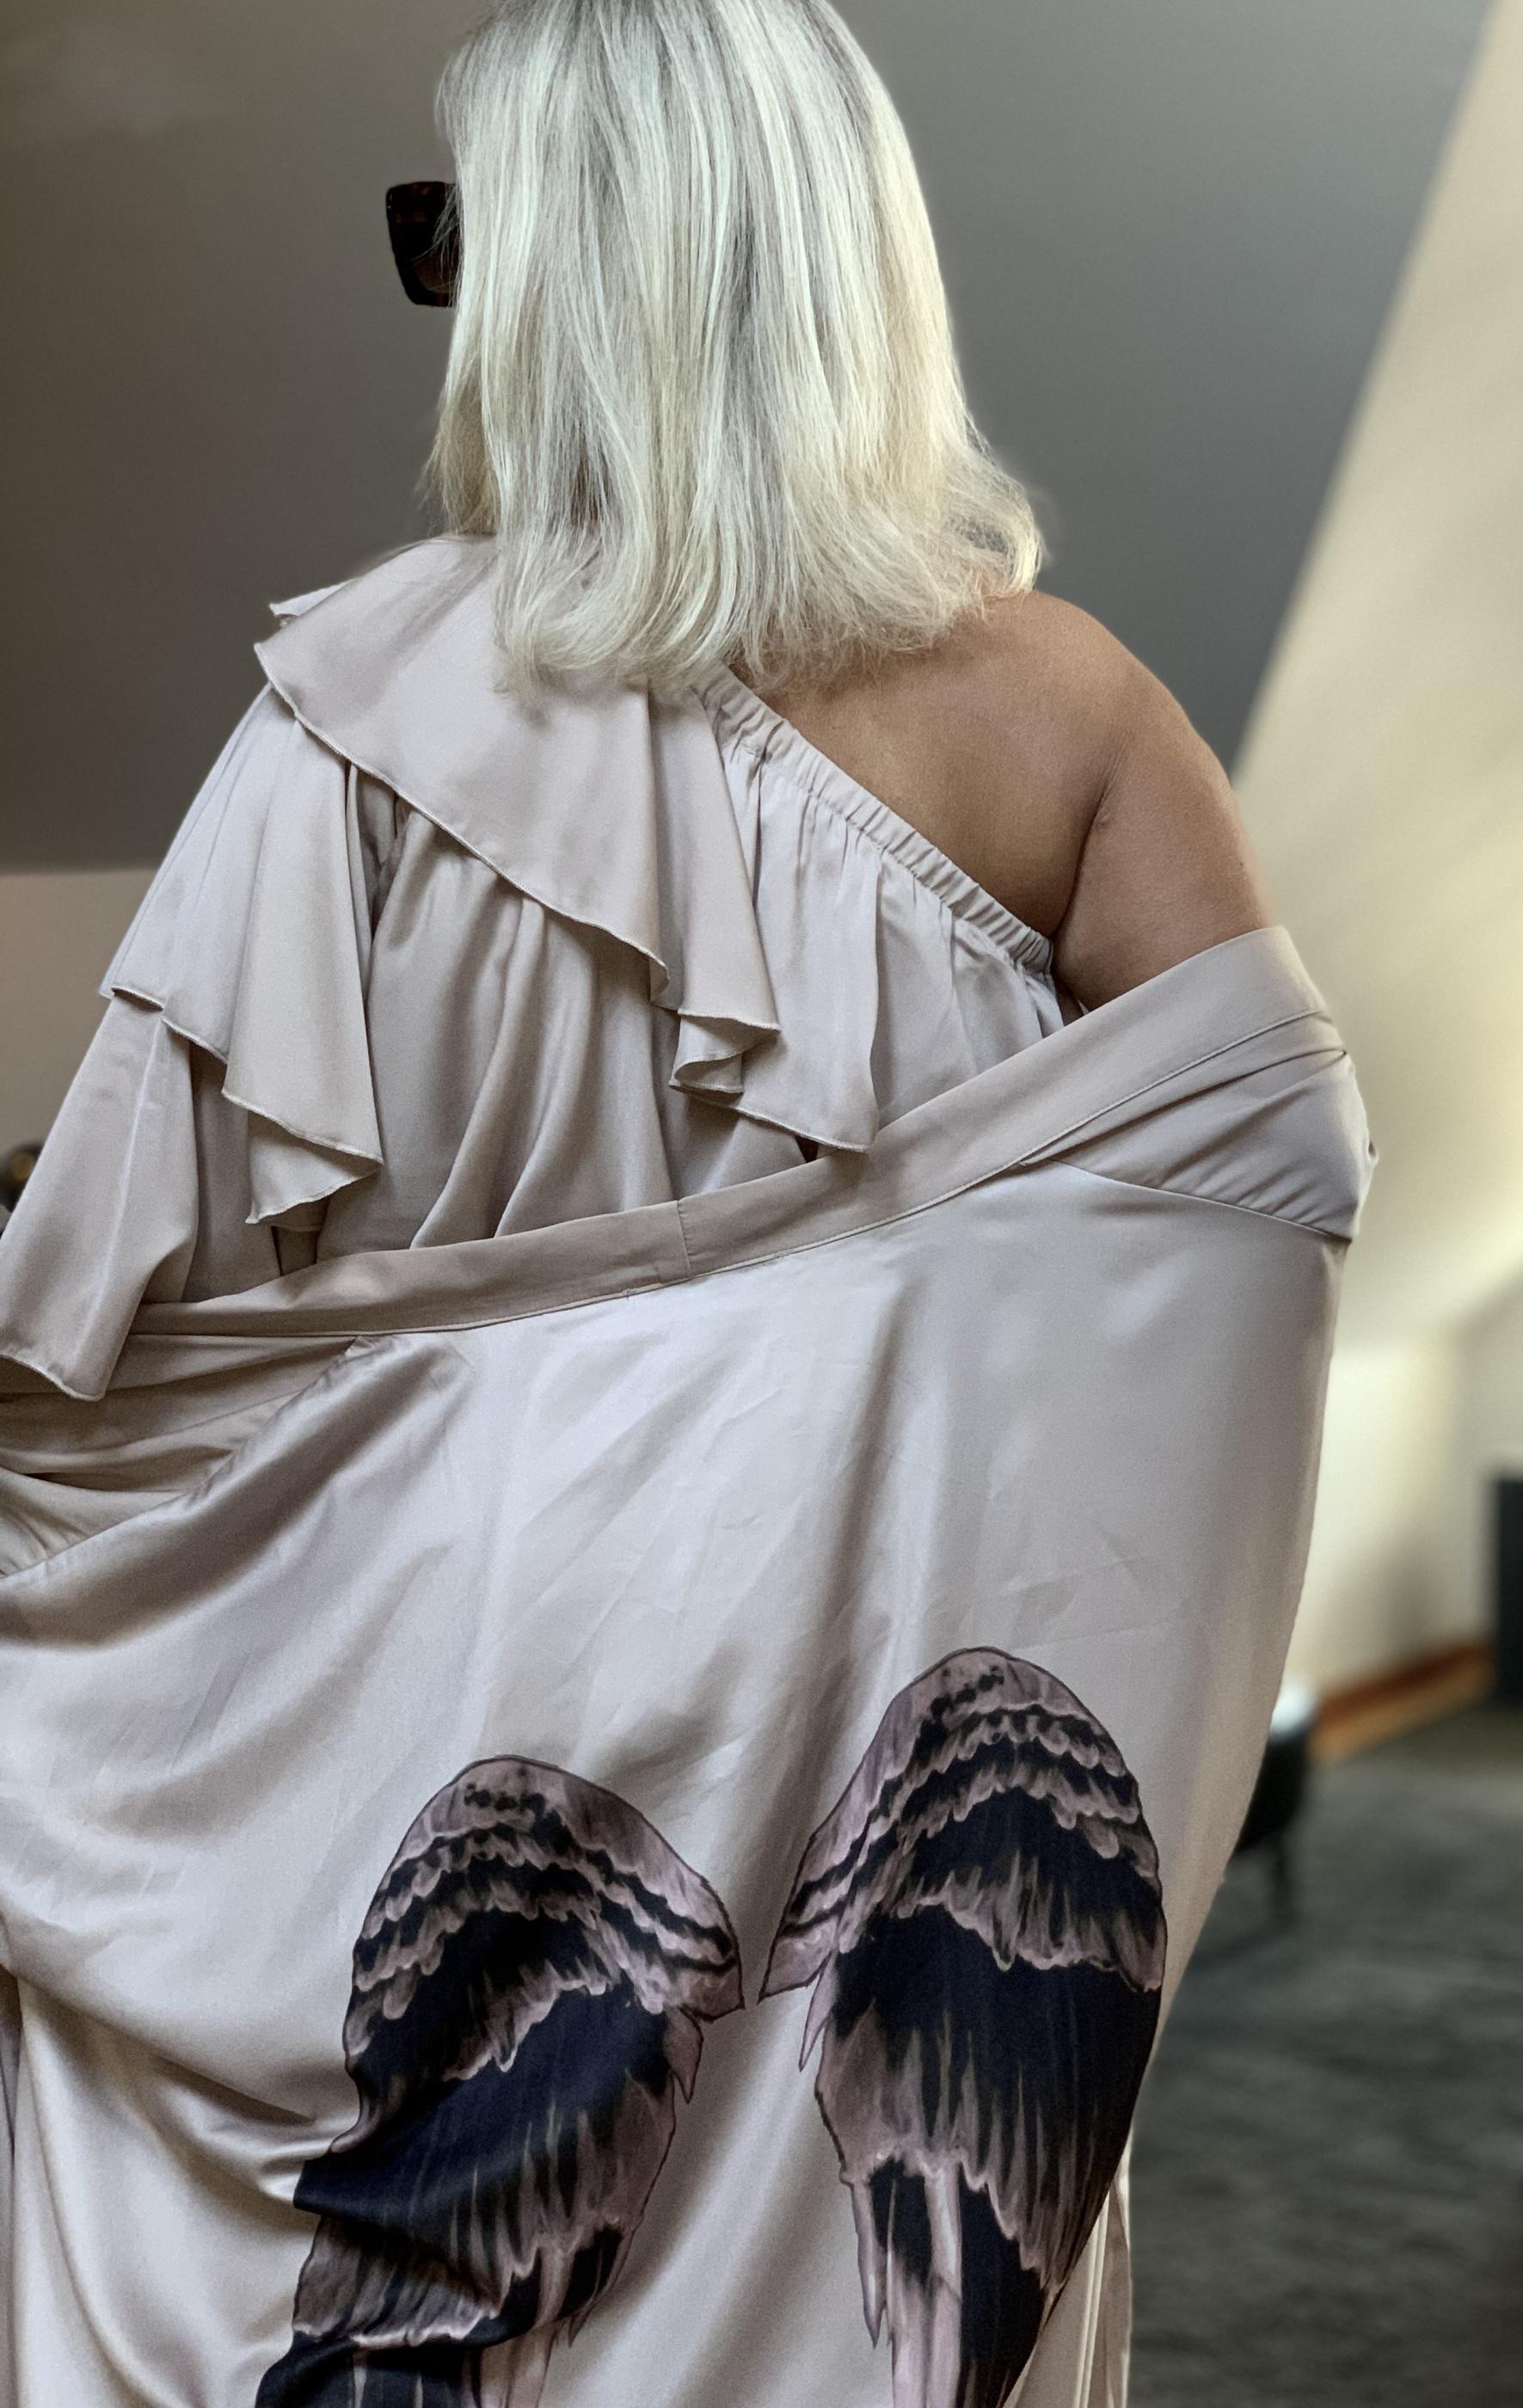 Recycle chic kimono Costa Mani IMAGE BY ME